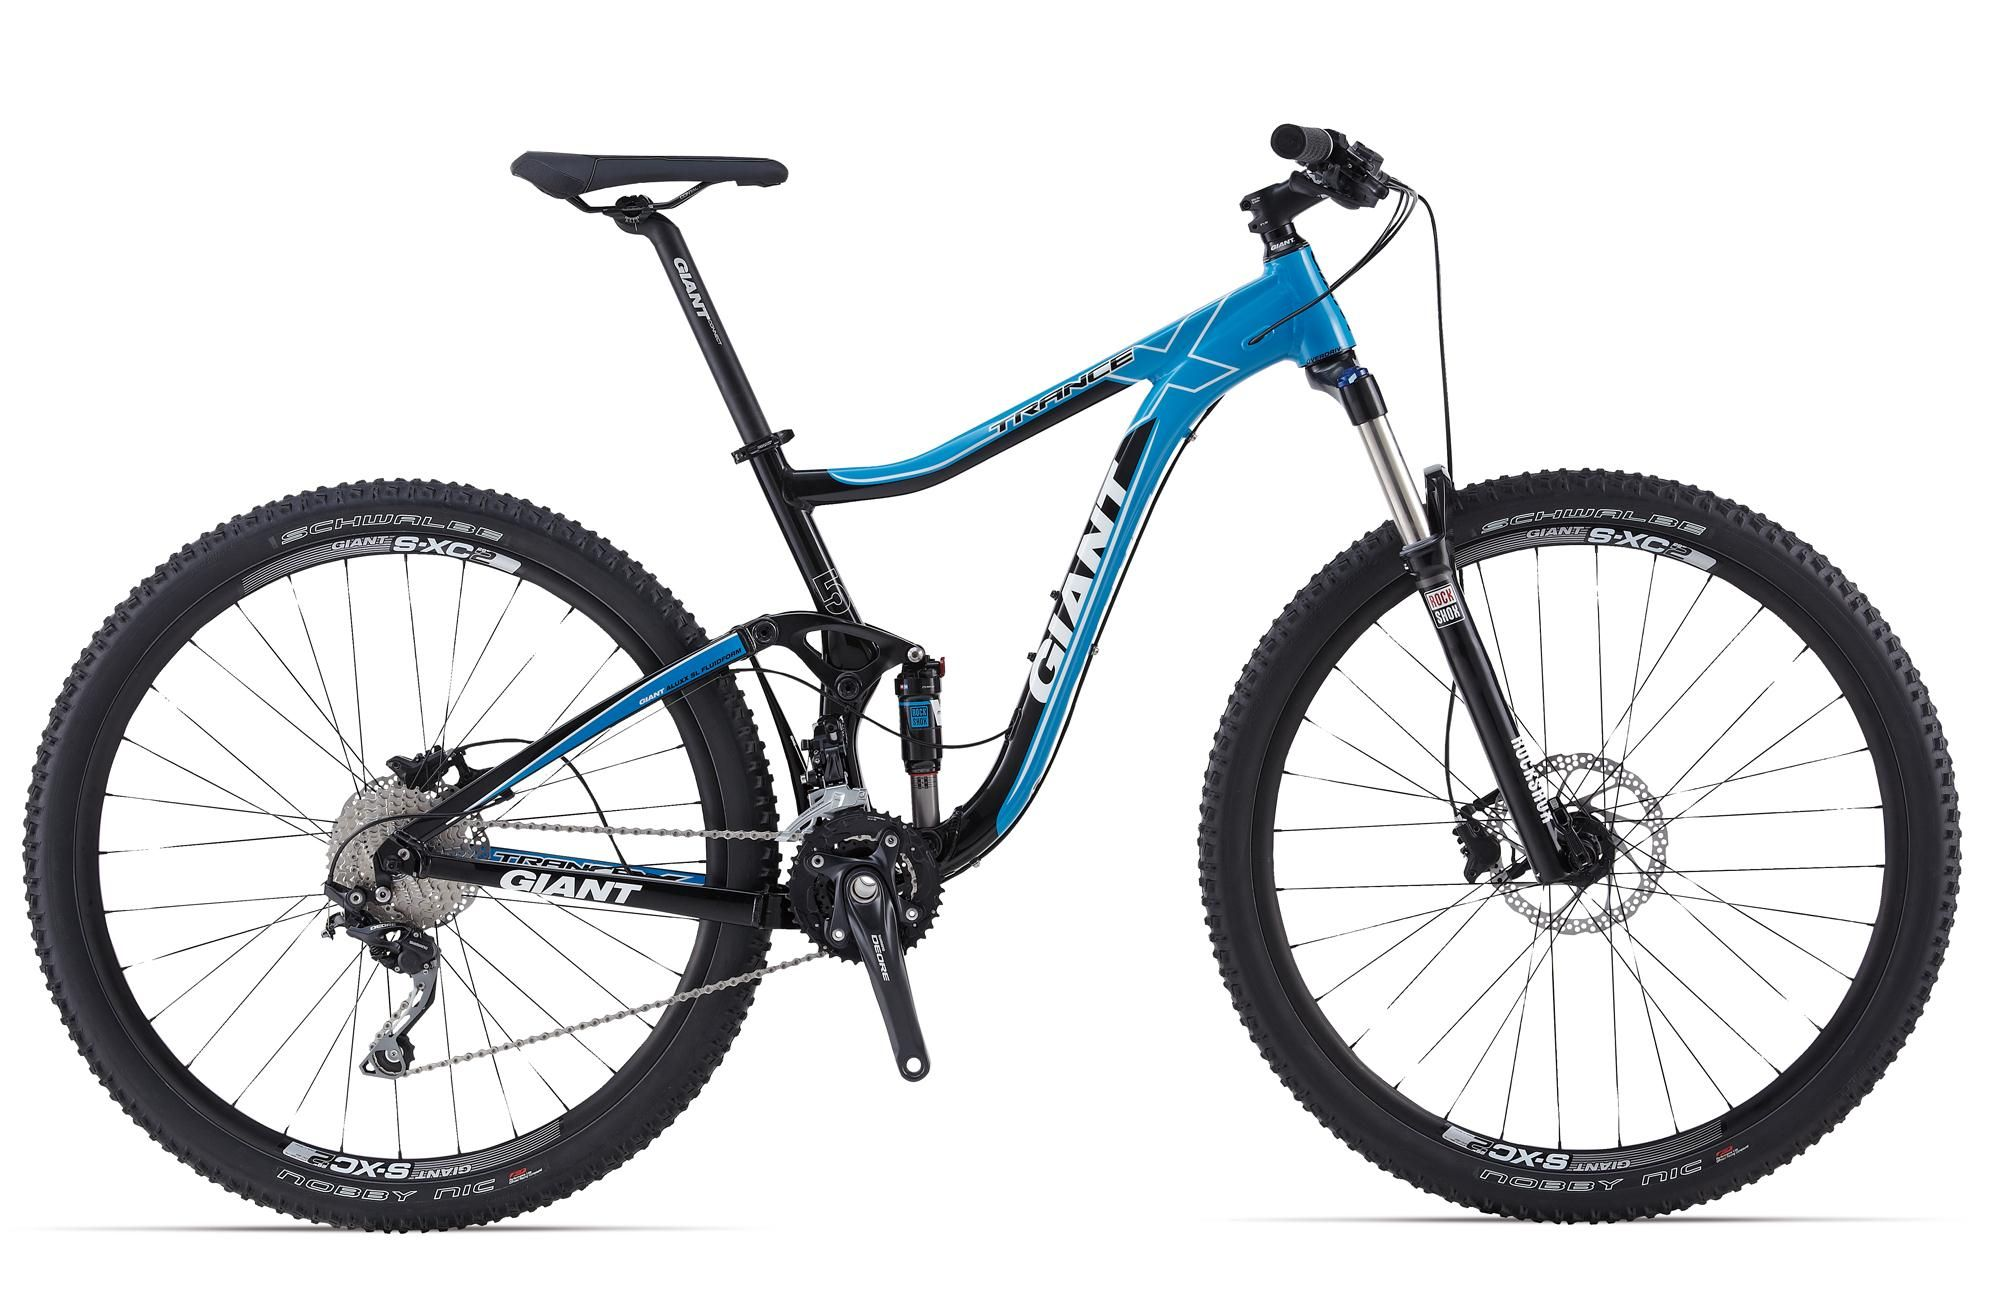 Велосипед Giant Trance X 29er 2 2014 giant trance x 29er 1 2014 silver